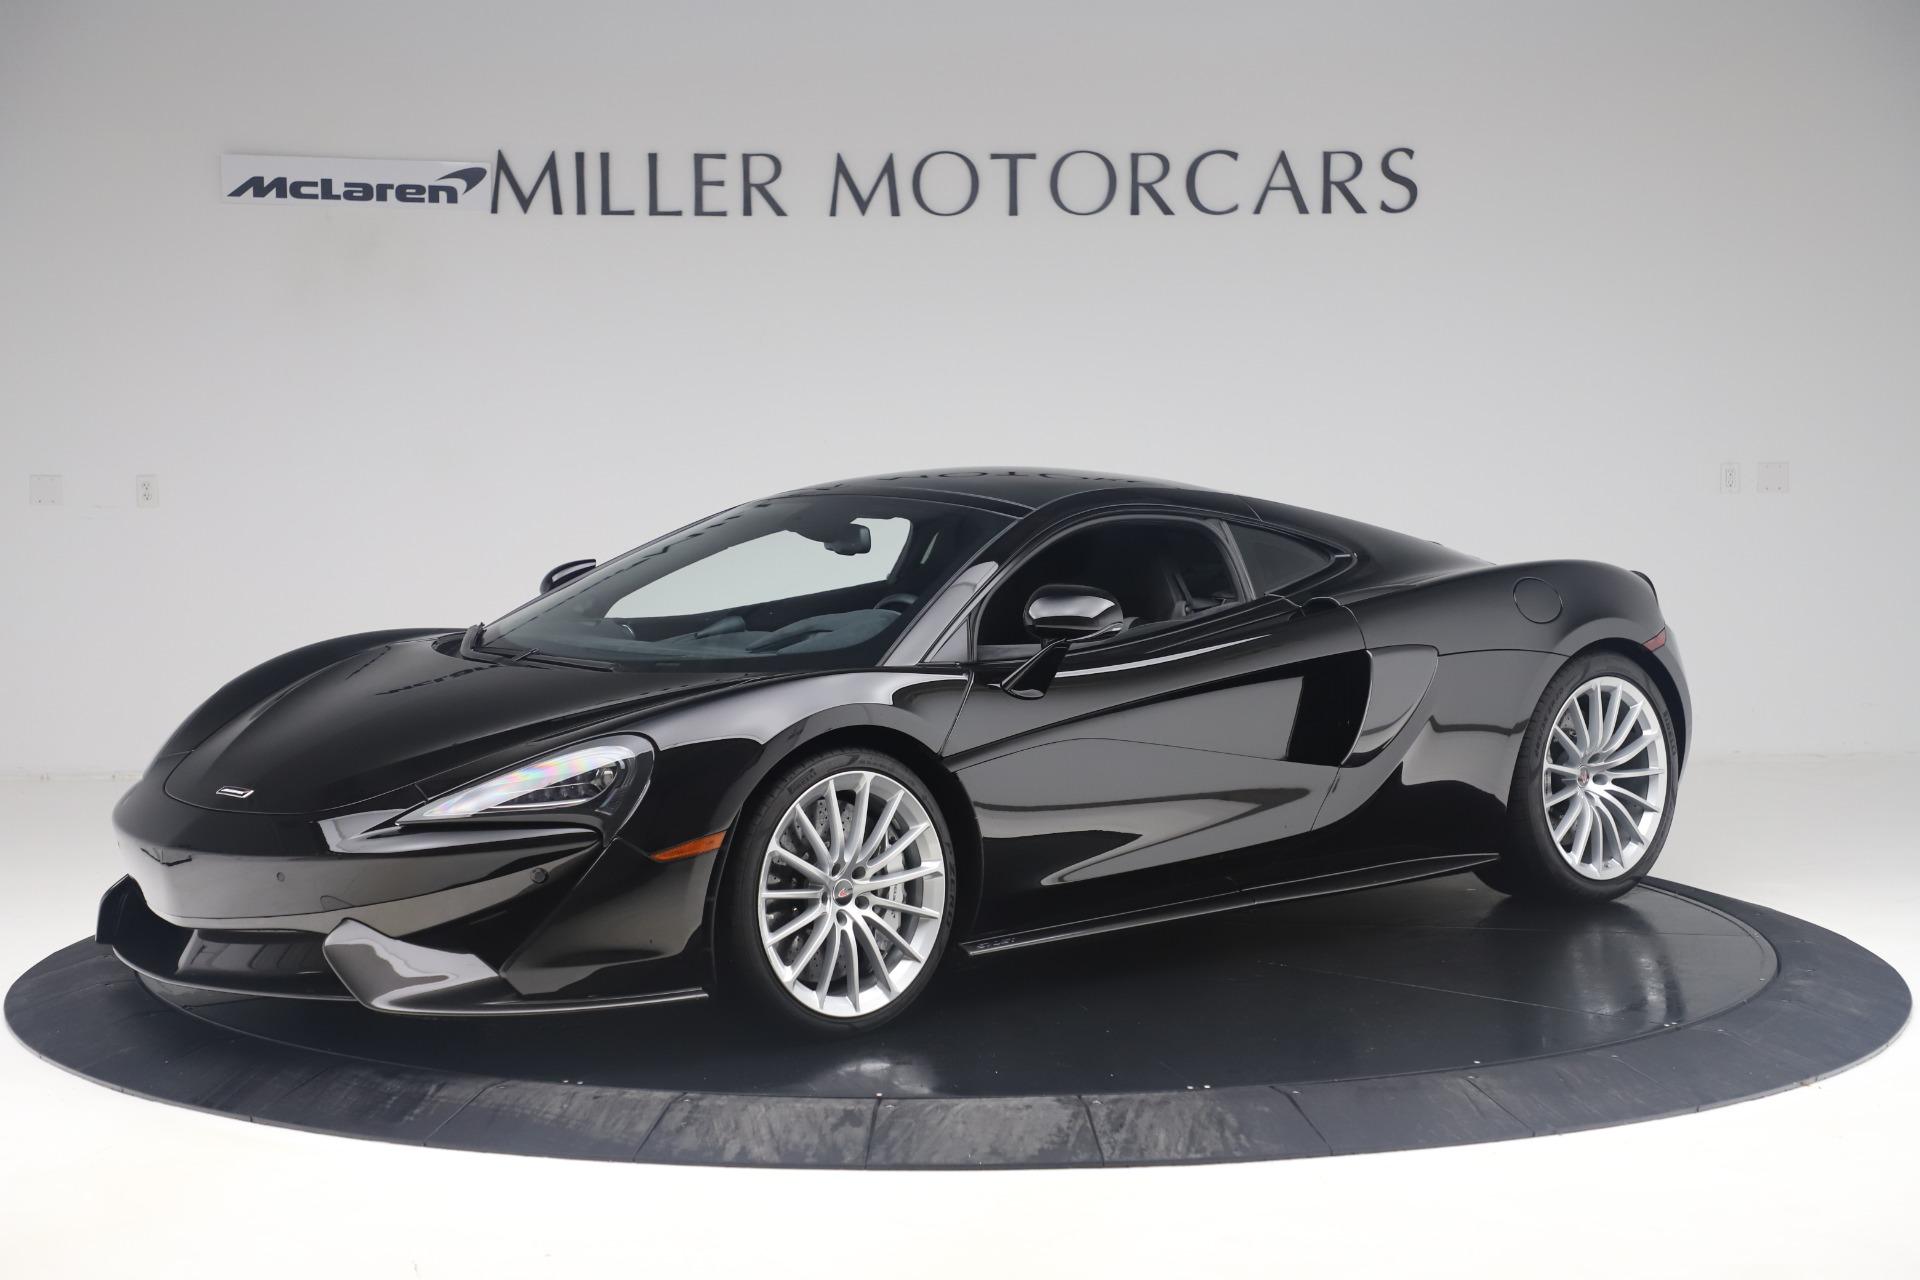 Used 2017 McLaren 570GT Coupe for sale $149,900 at Alfa Romeo of Westport in Westport CT 06880 1